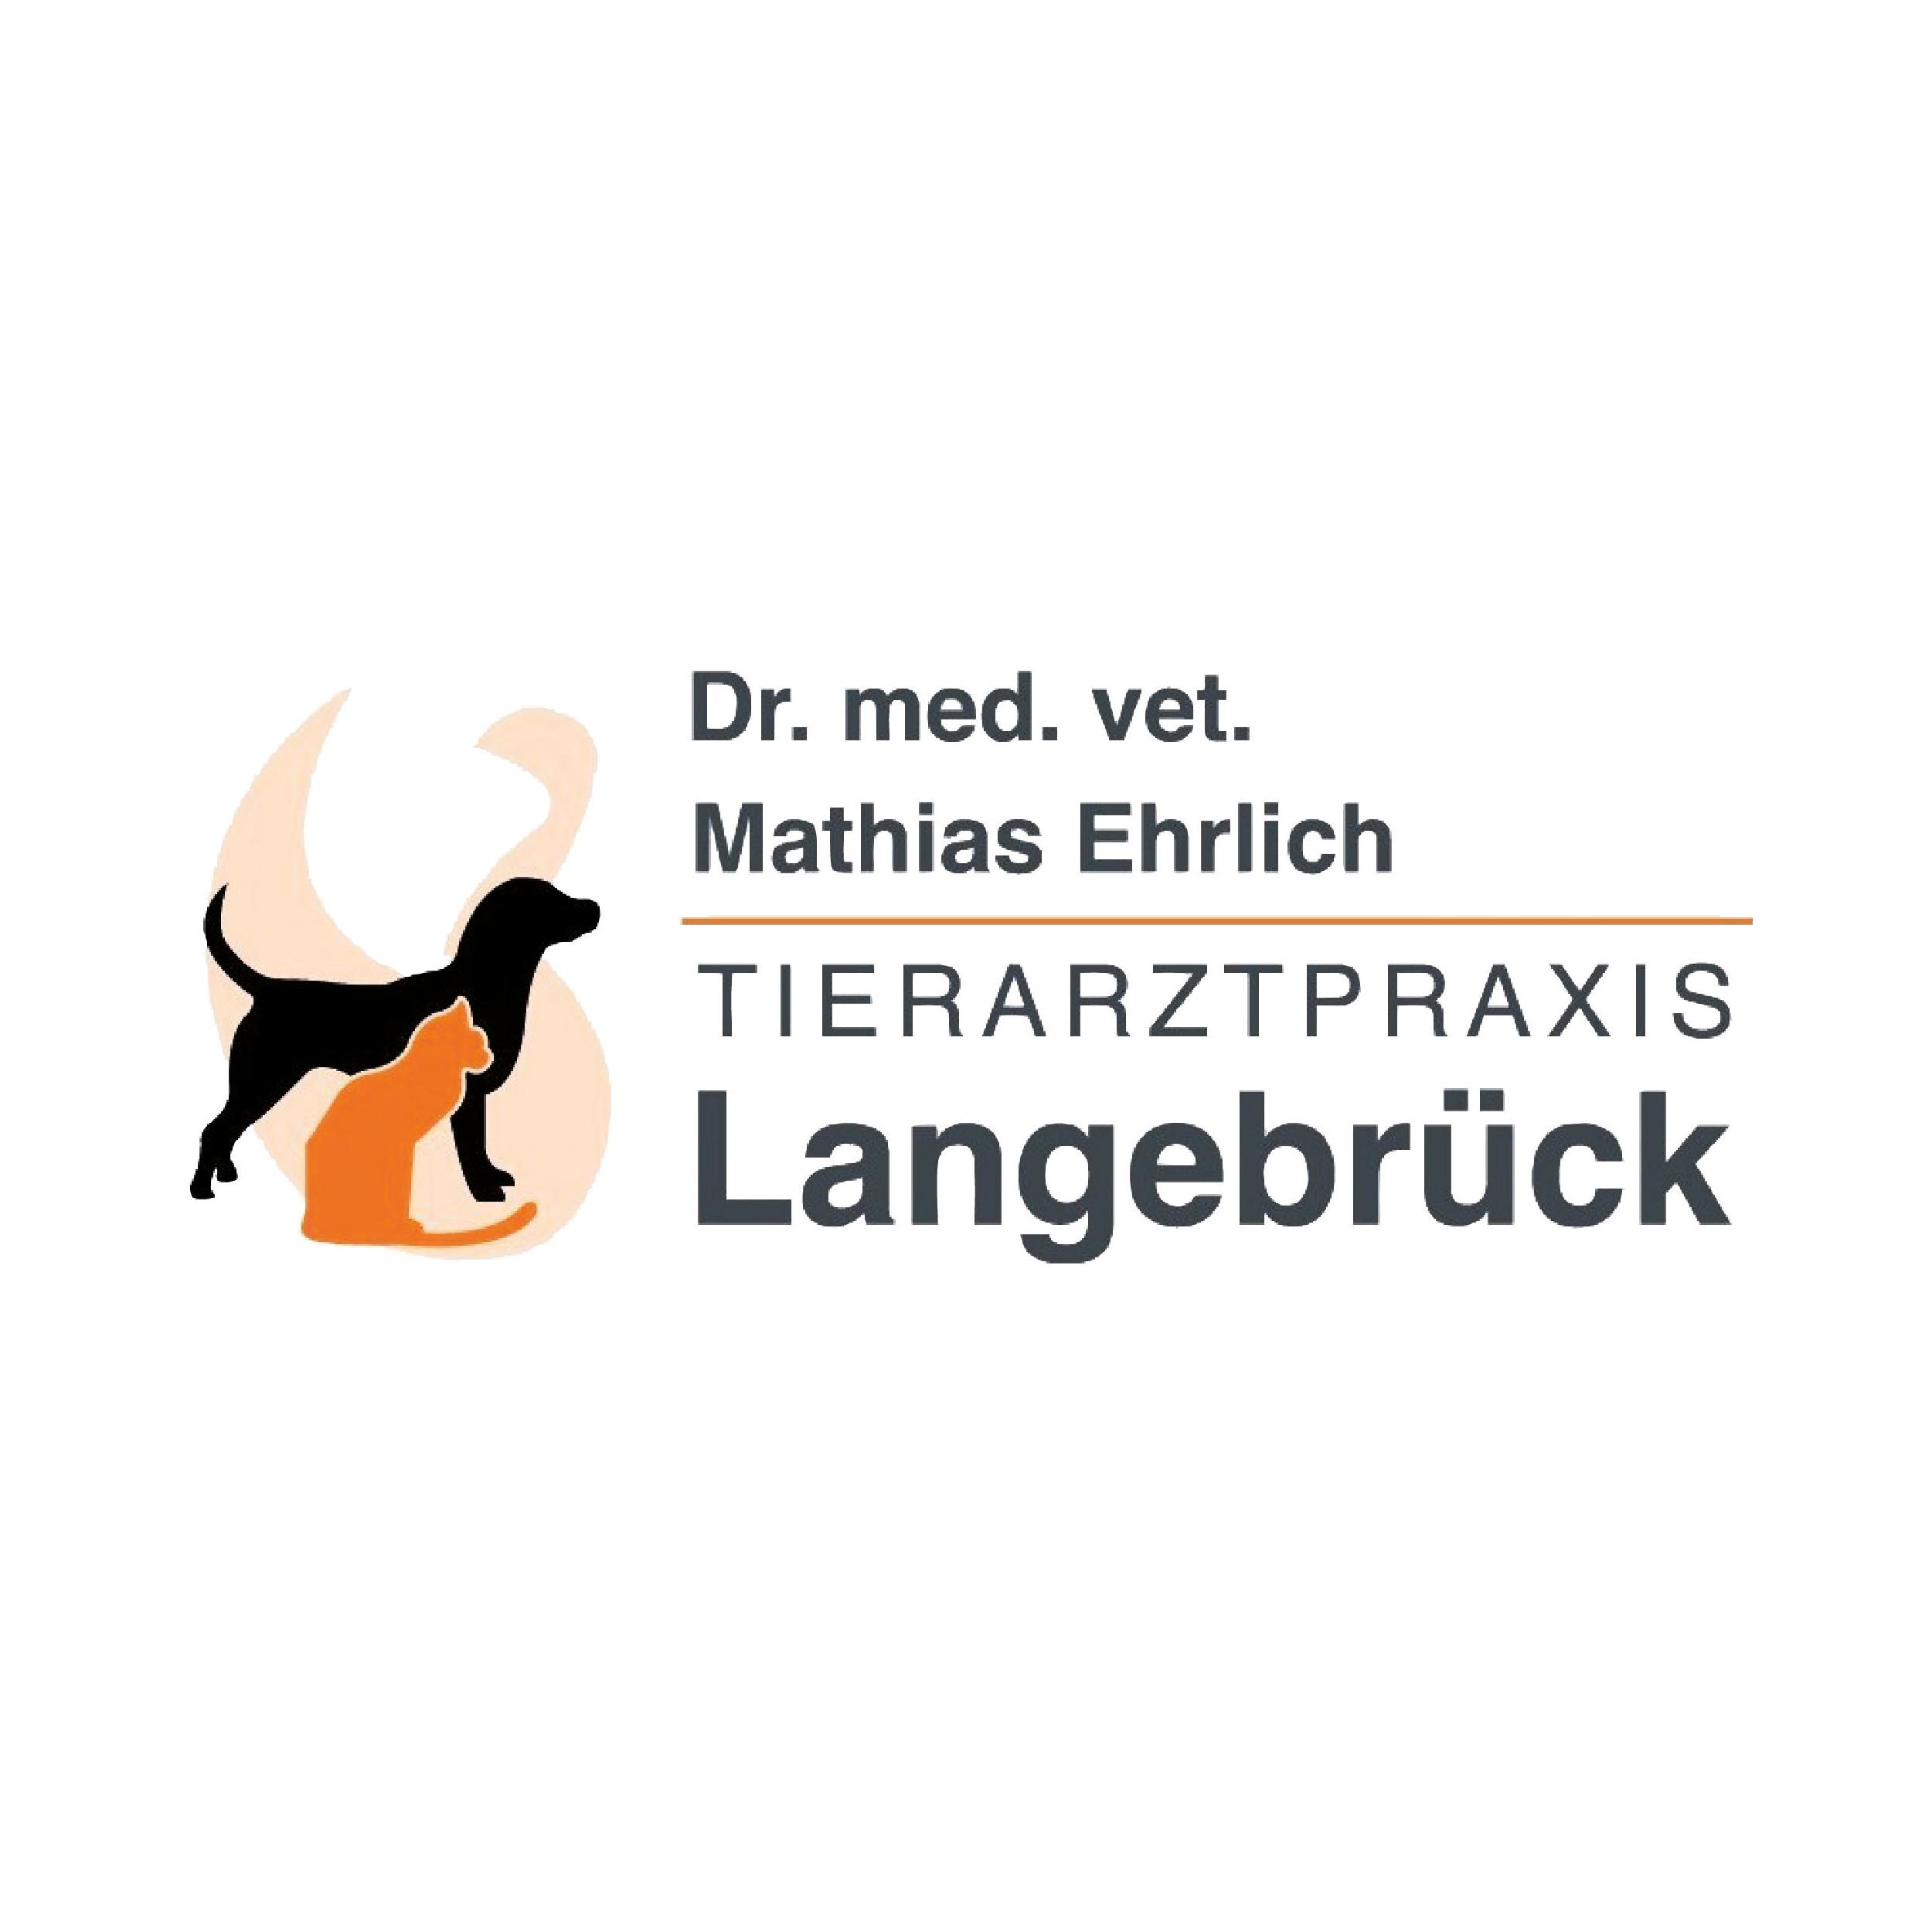 Bild zu Tierarztpraxis Langebrück - Dr. med. vet. Mathias Ehrlich in Langebrück Stadt Dresden